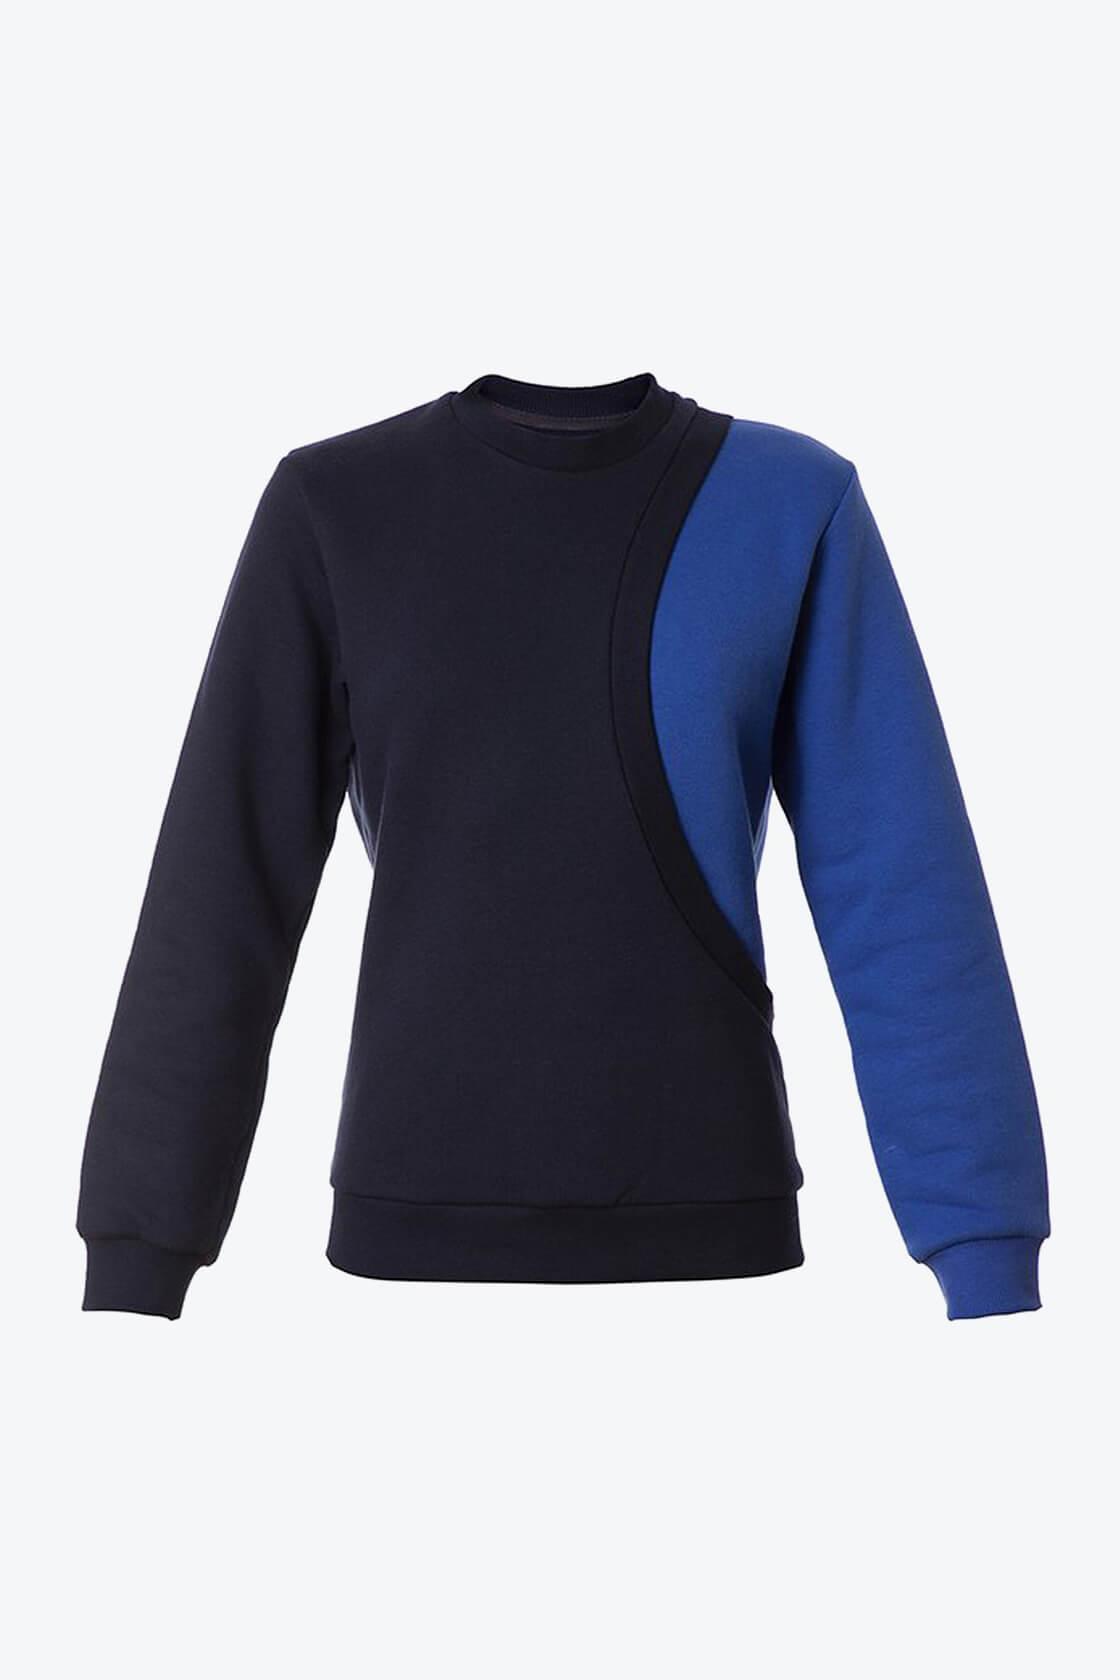 OL10000179 One sleeve sweatshirt blue1